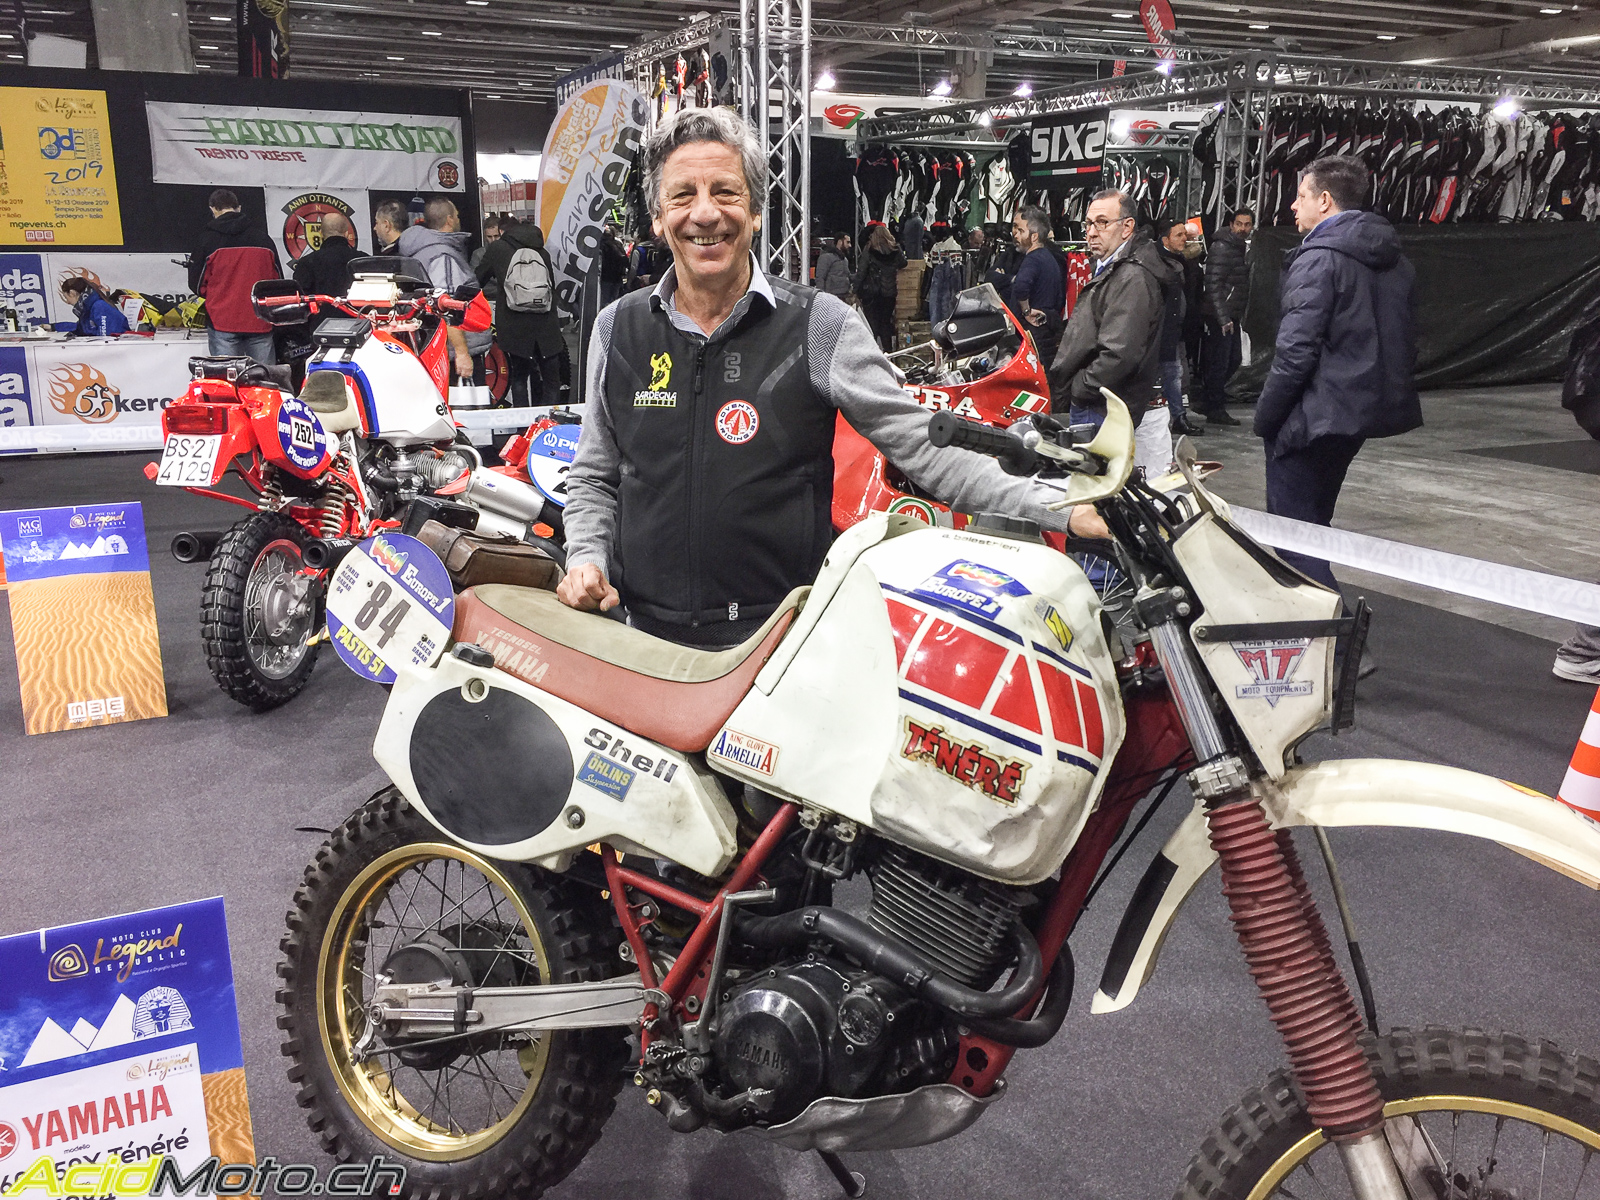 L'incroyable Dakar 84 de Renato Zocchi Renato-0625